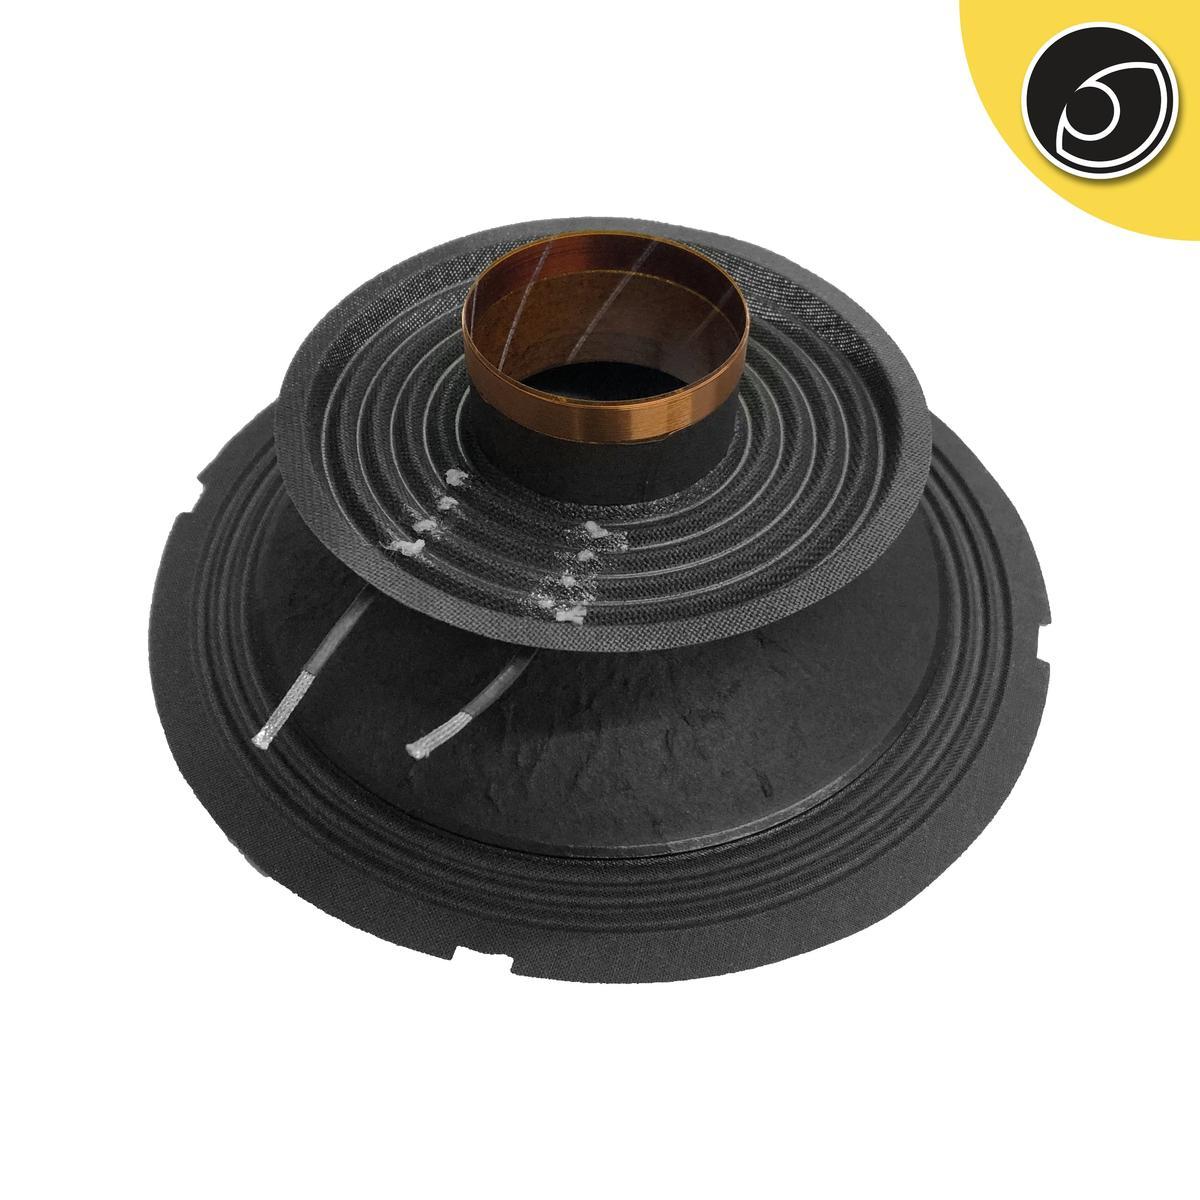 Bassface SPL8M.2NEO 8 Inch 20cm Neodymium Midrange Recone Kit 1x4 Ohm SVC